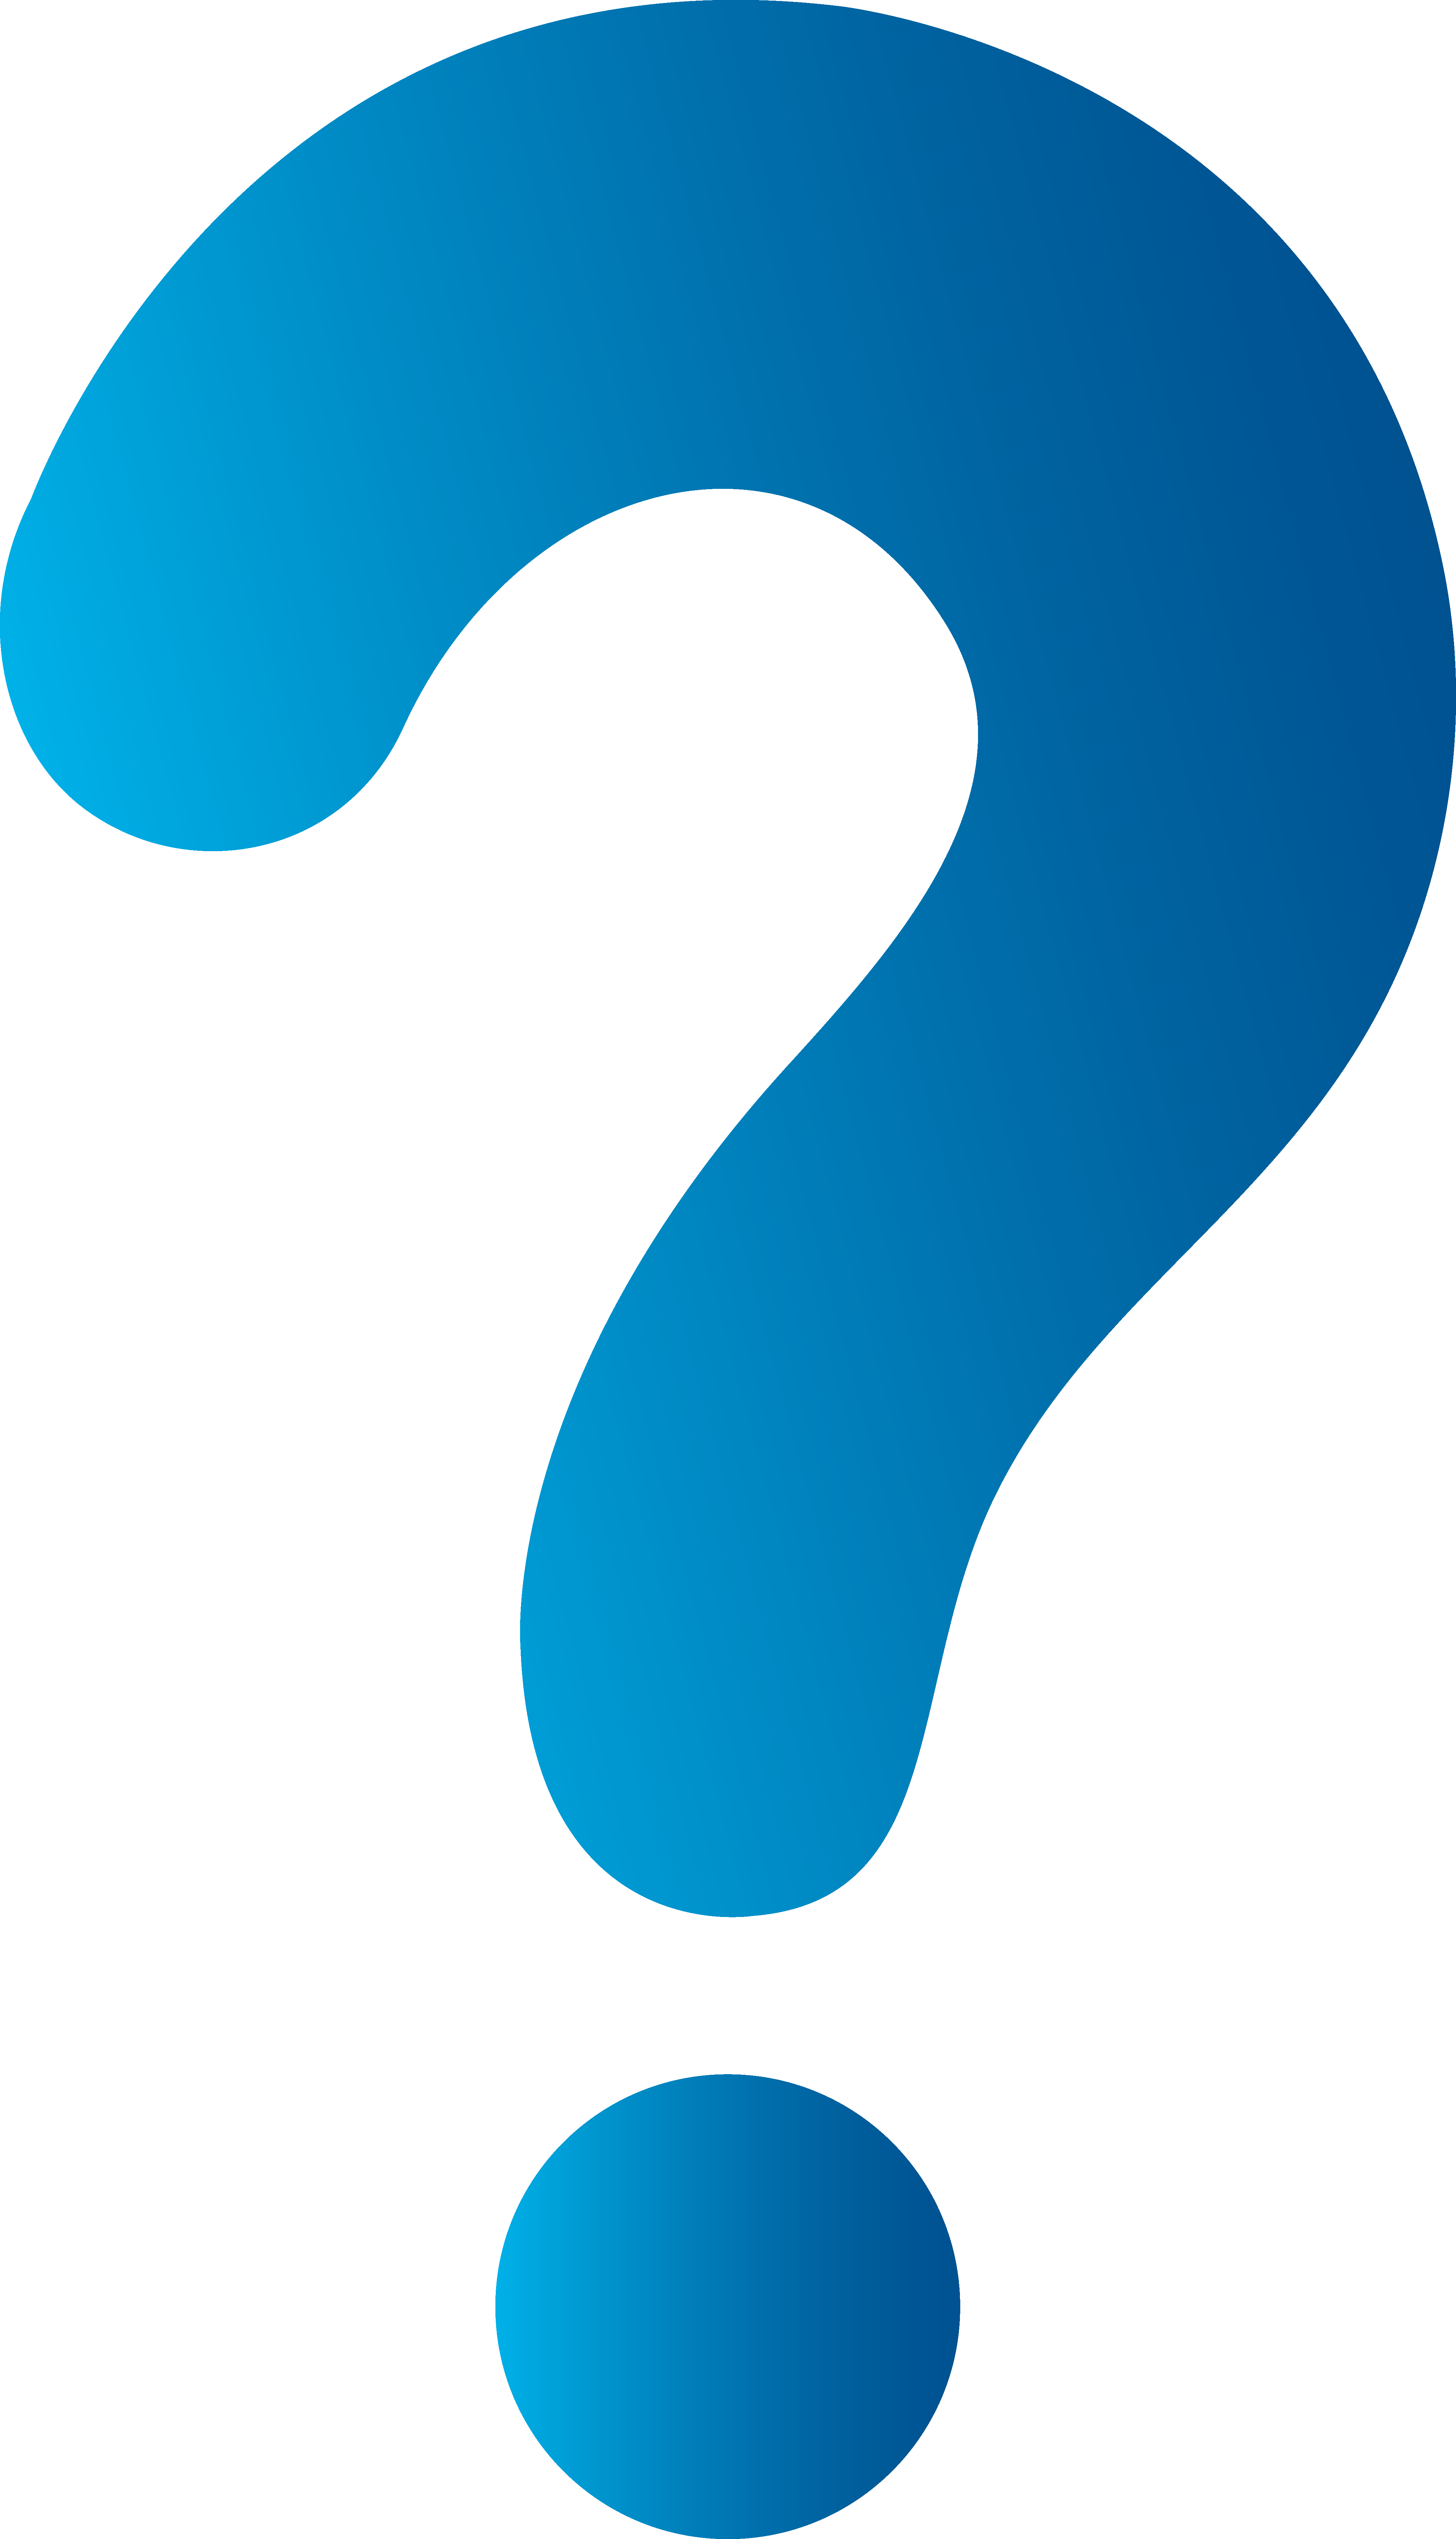 question-question_mark_blue